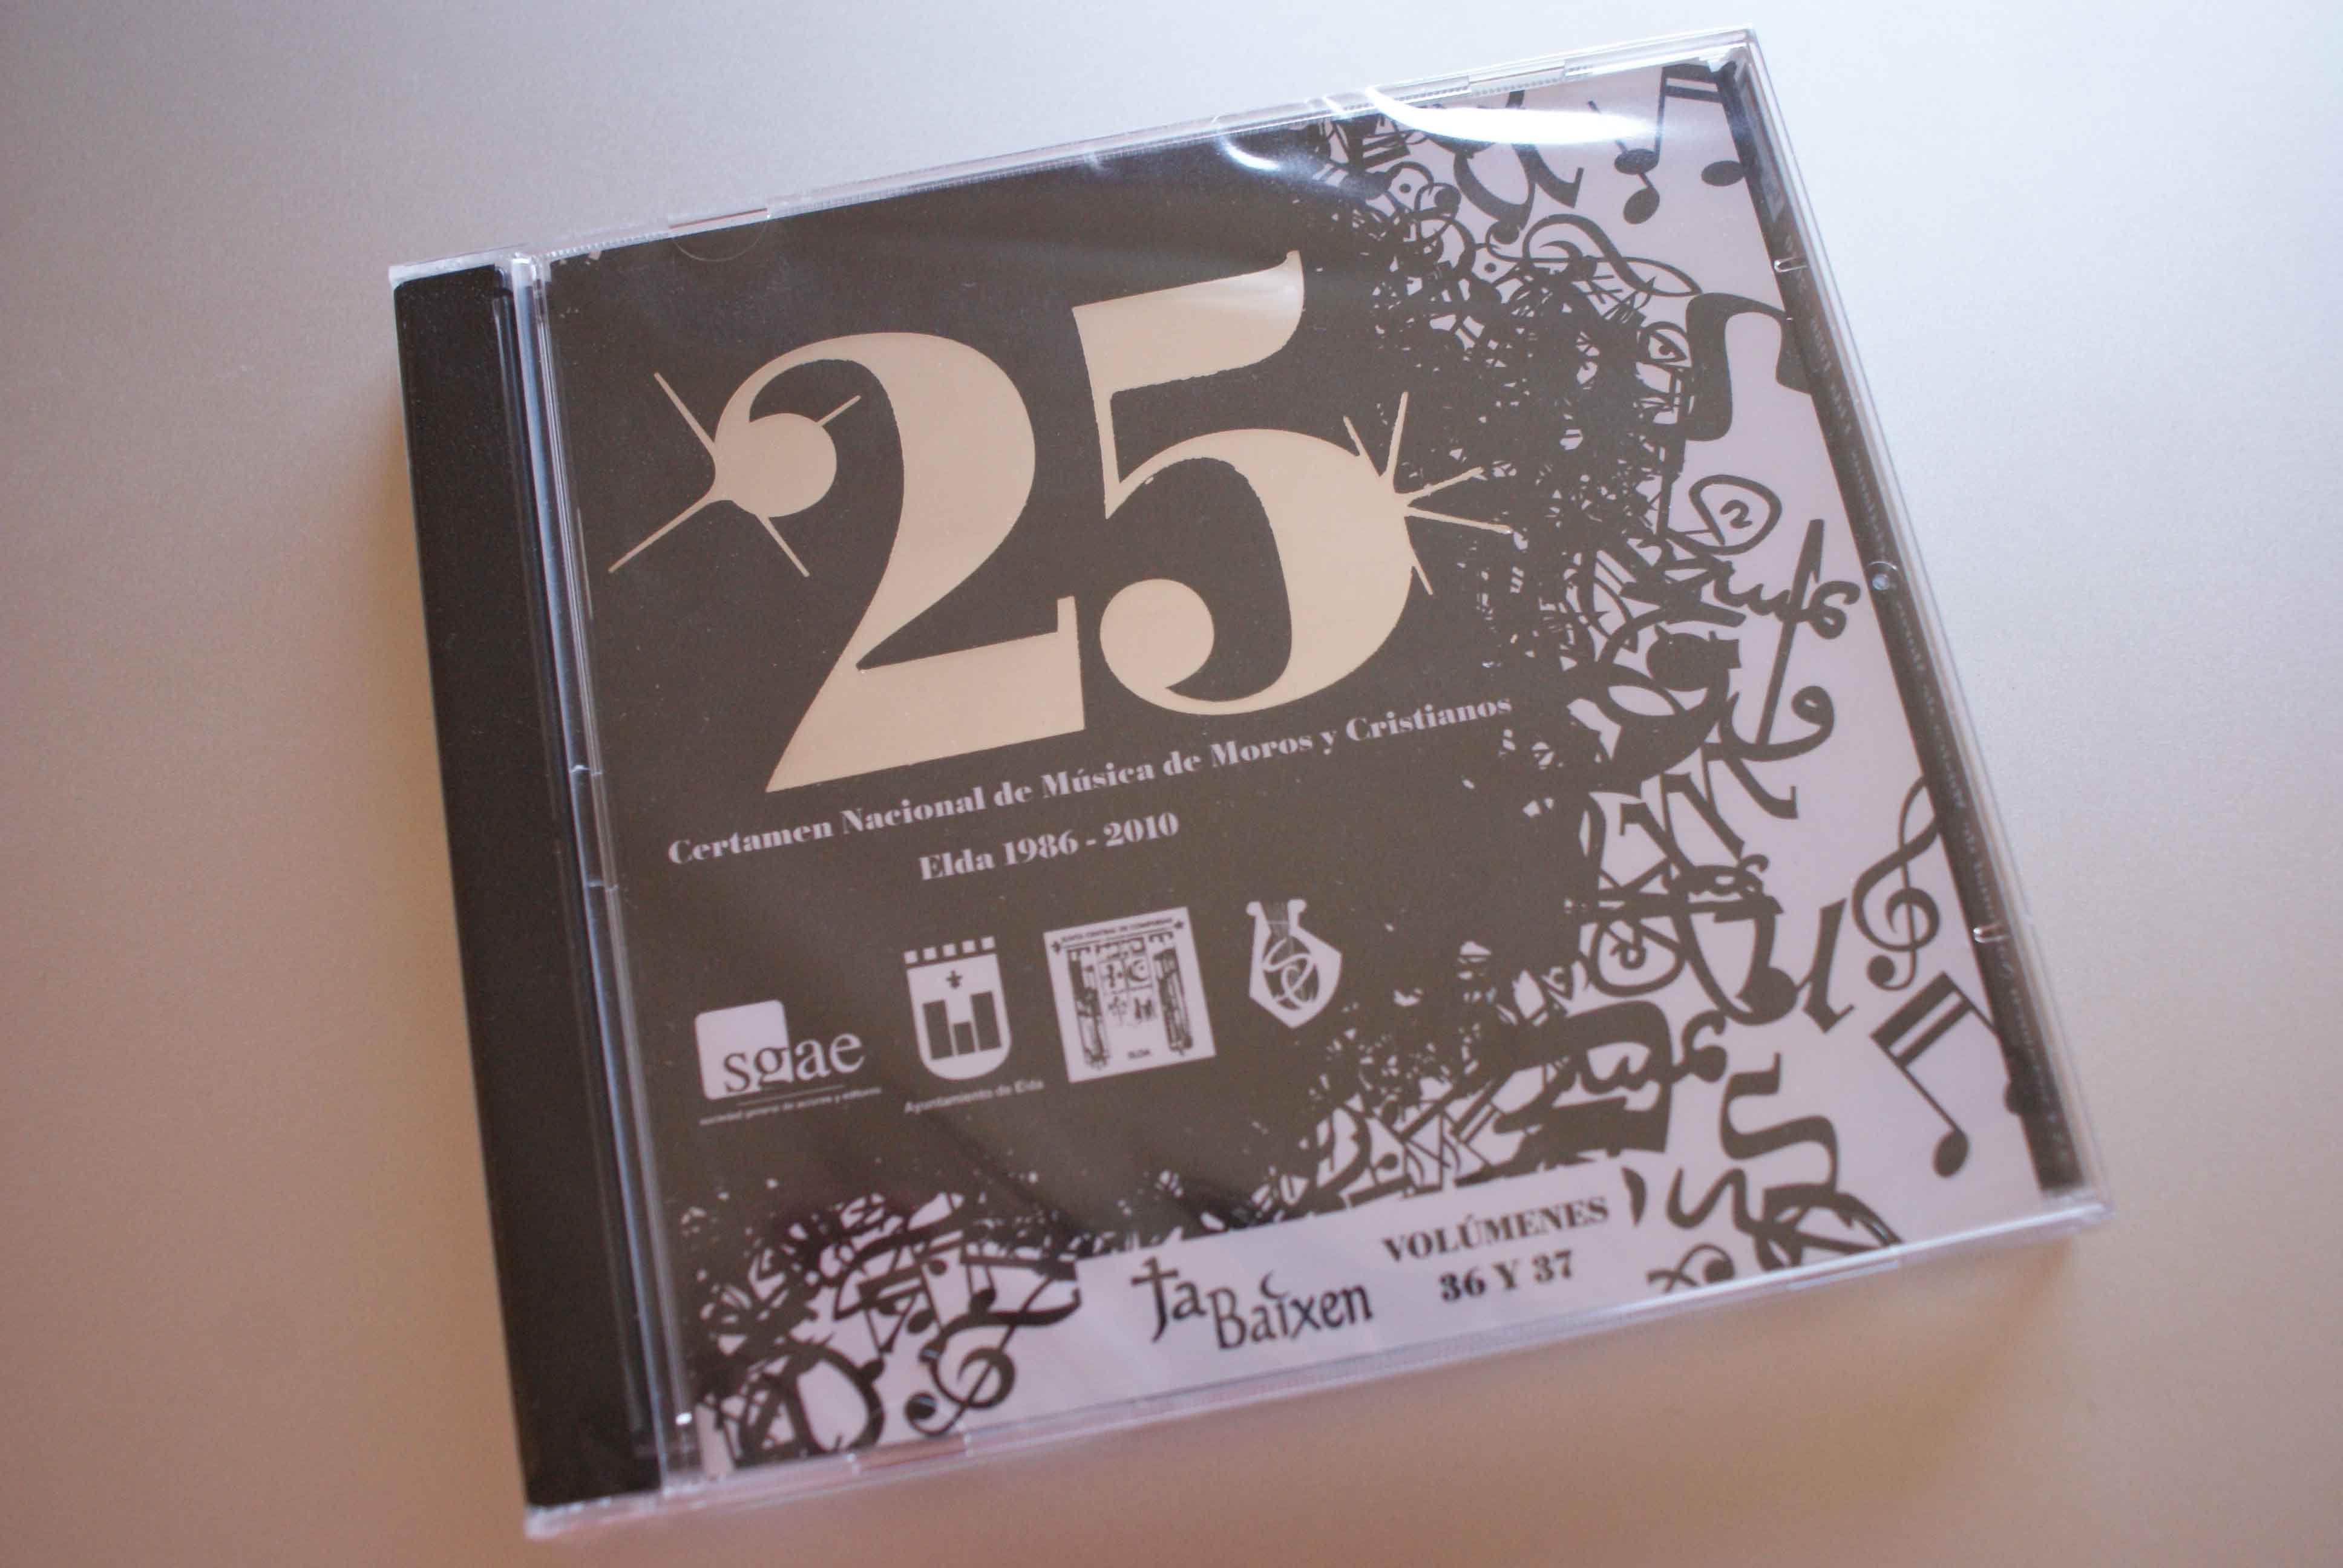 musica festera cd: